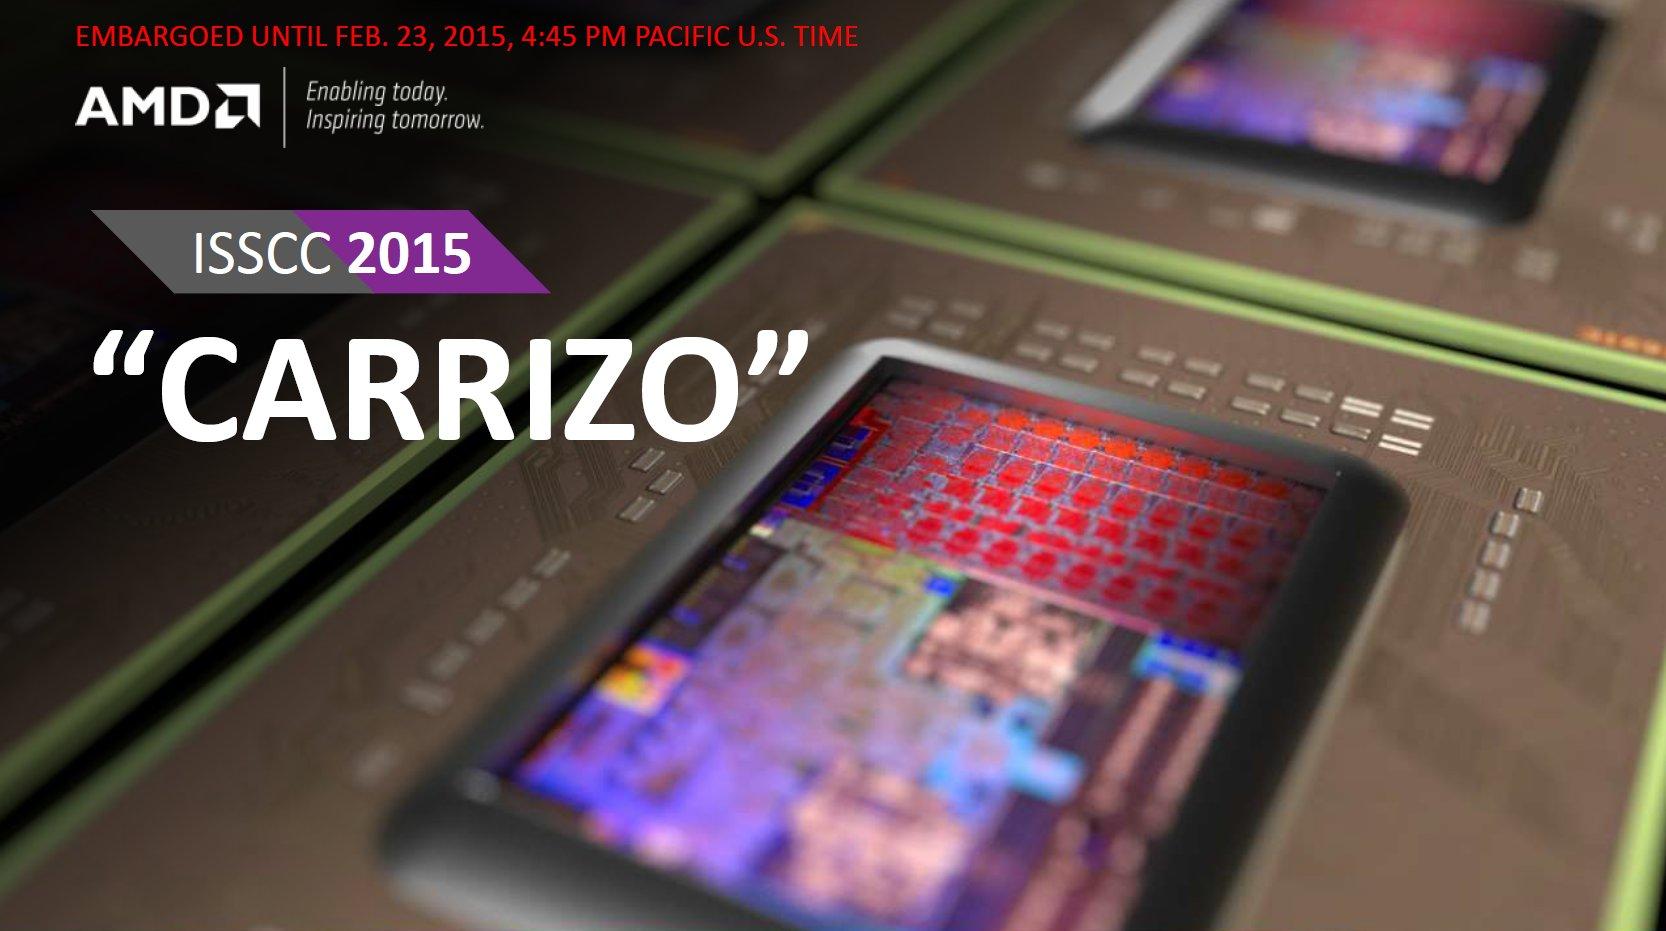 AMD Carrizo zur ISSCC 2015